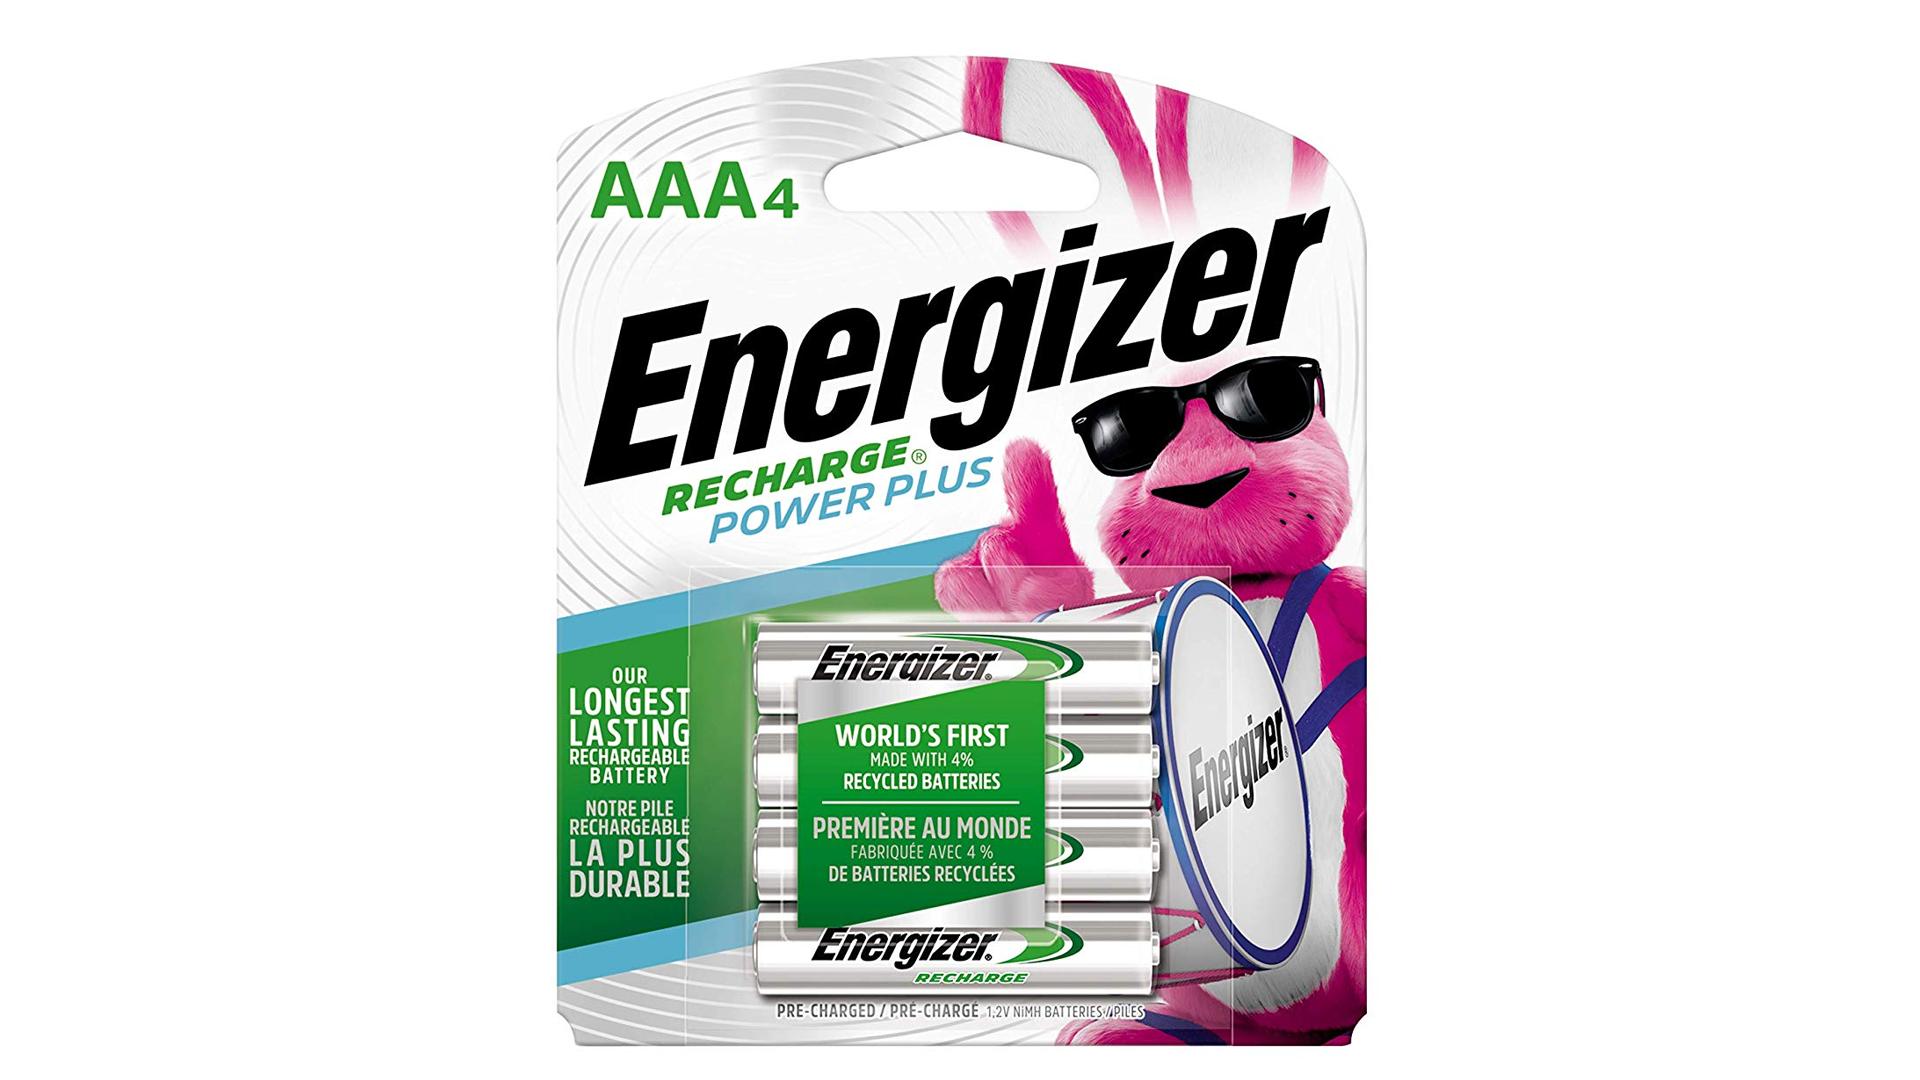 Energizer rechargable AAA batteries